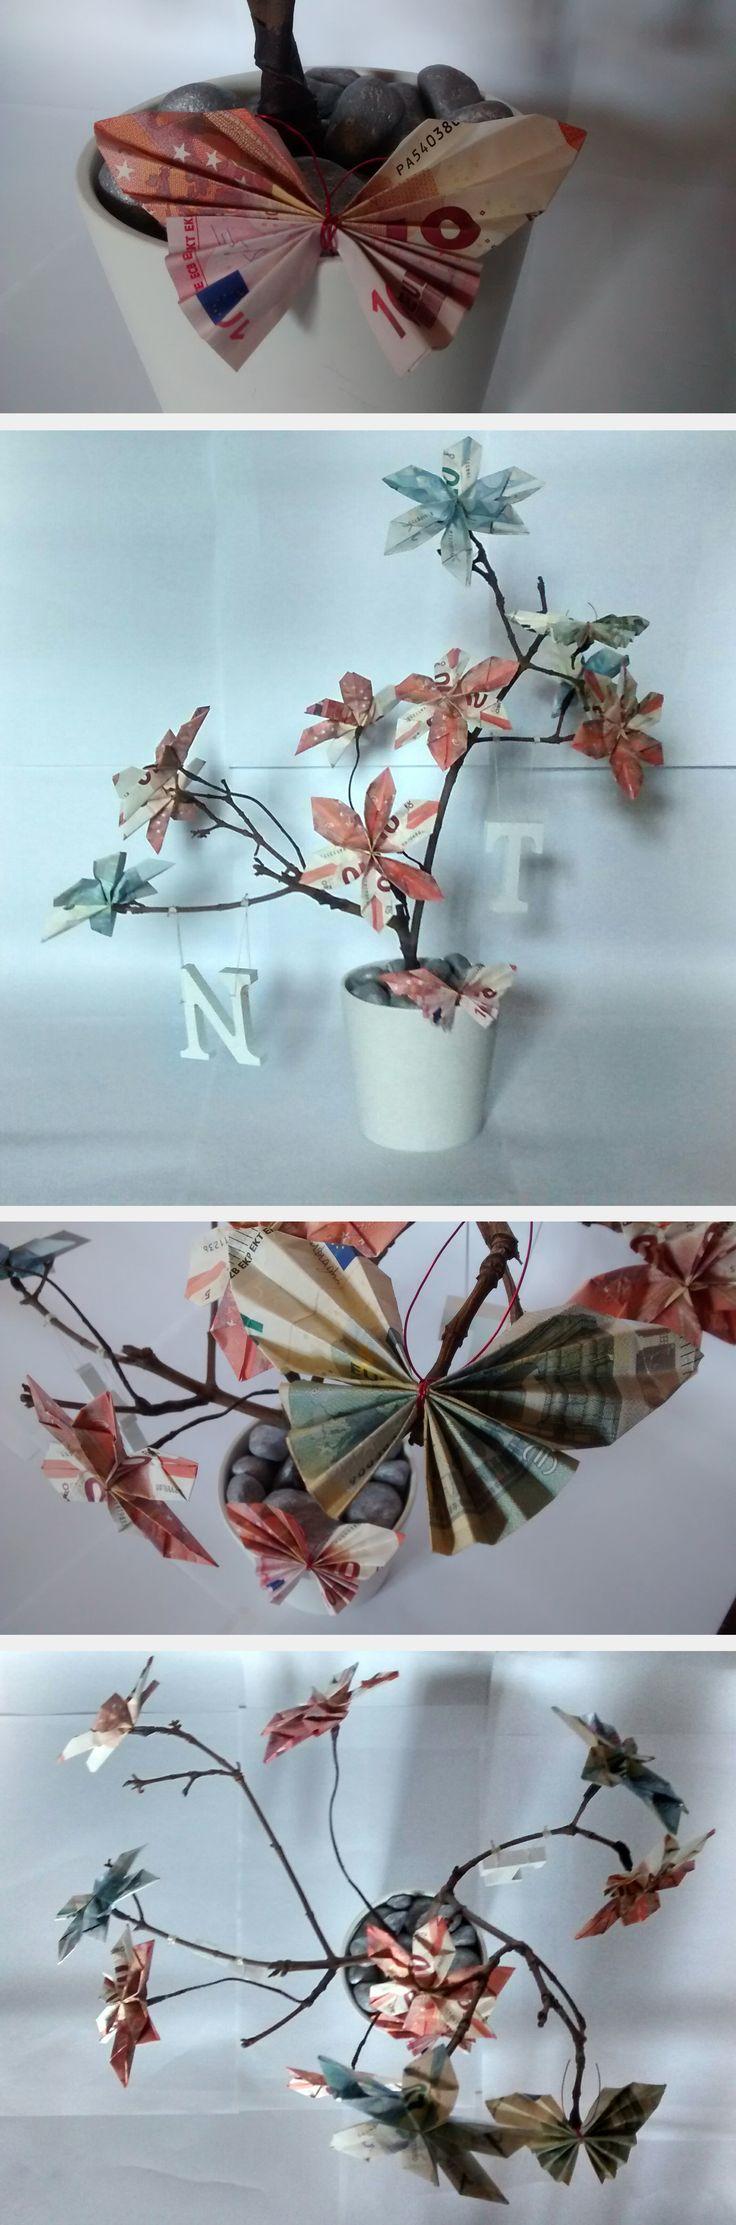 #Marta RC #Bonsai dinero #Diseño #Design #Regalo boda #Manualidades #Original #flores #mariposas #árbol